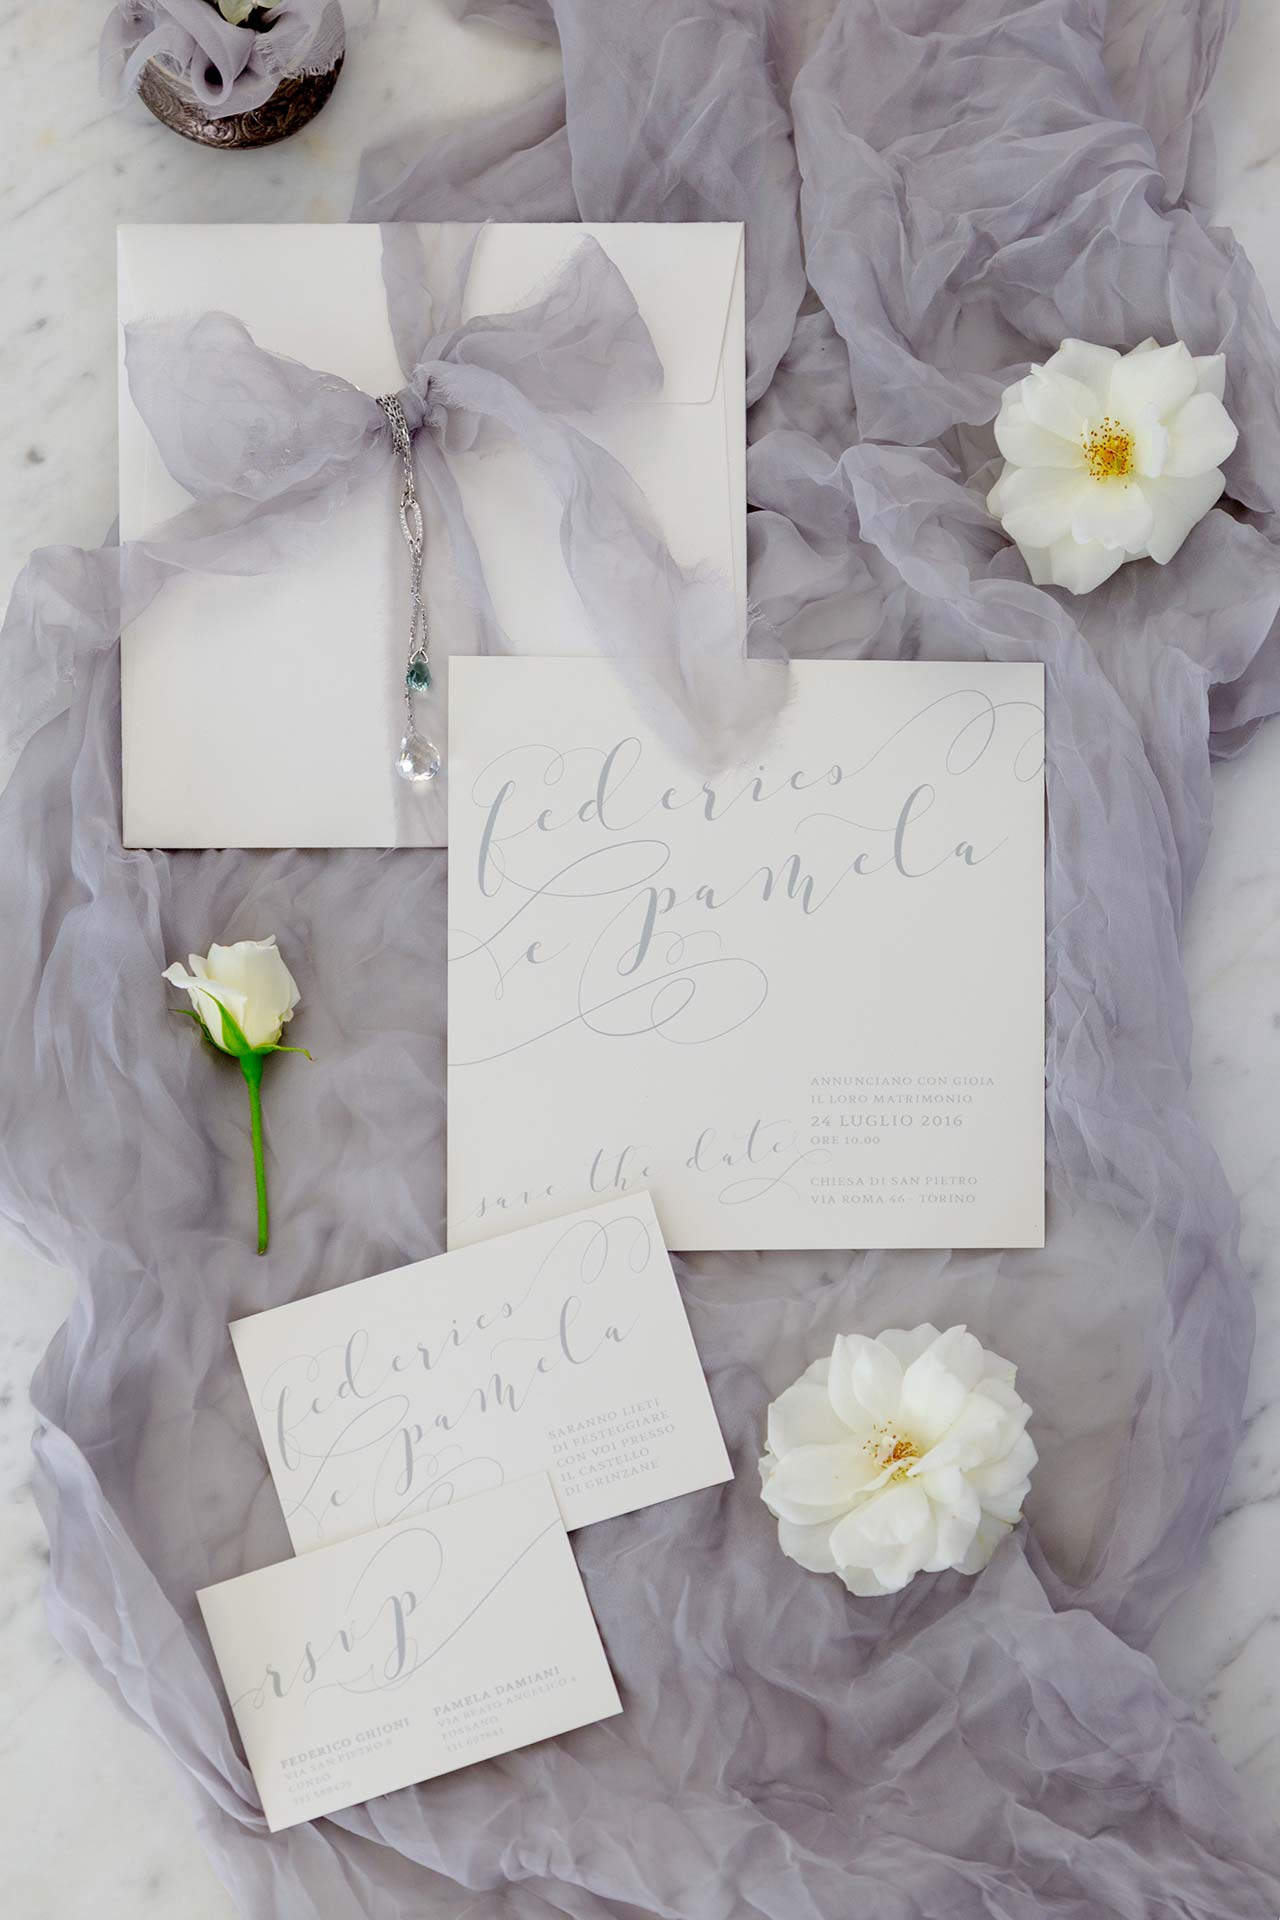 Douce calligraphie / Rosa Cipria